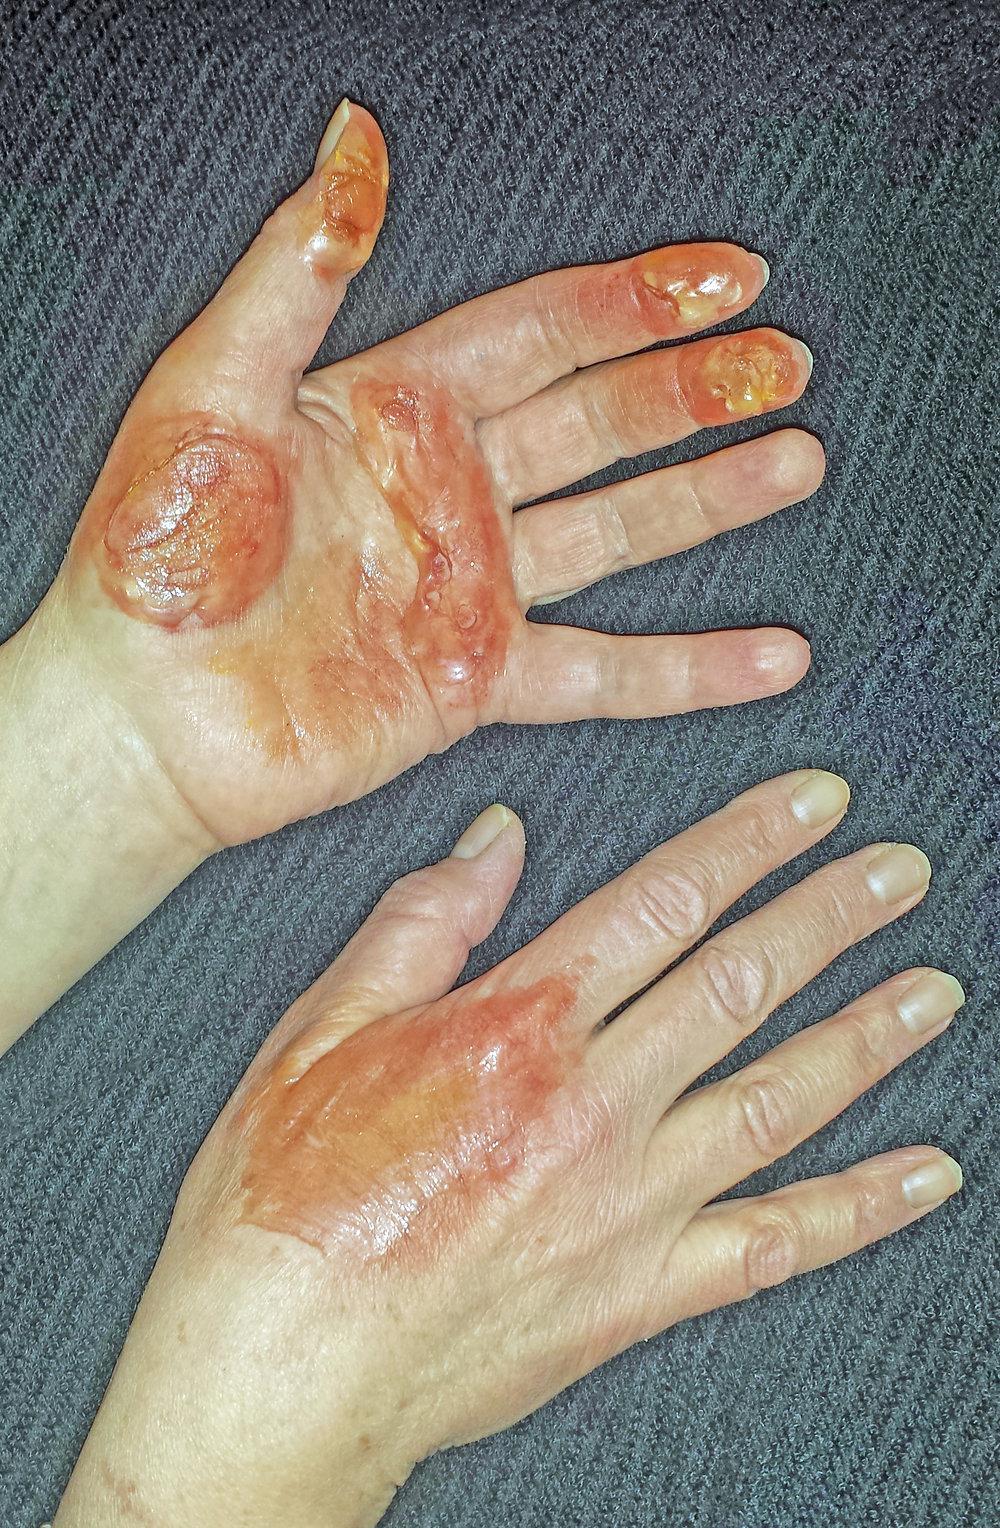 burnt hands.jpg